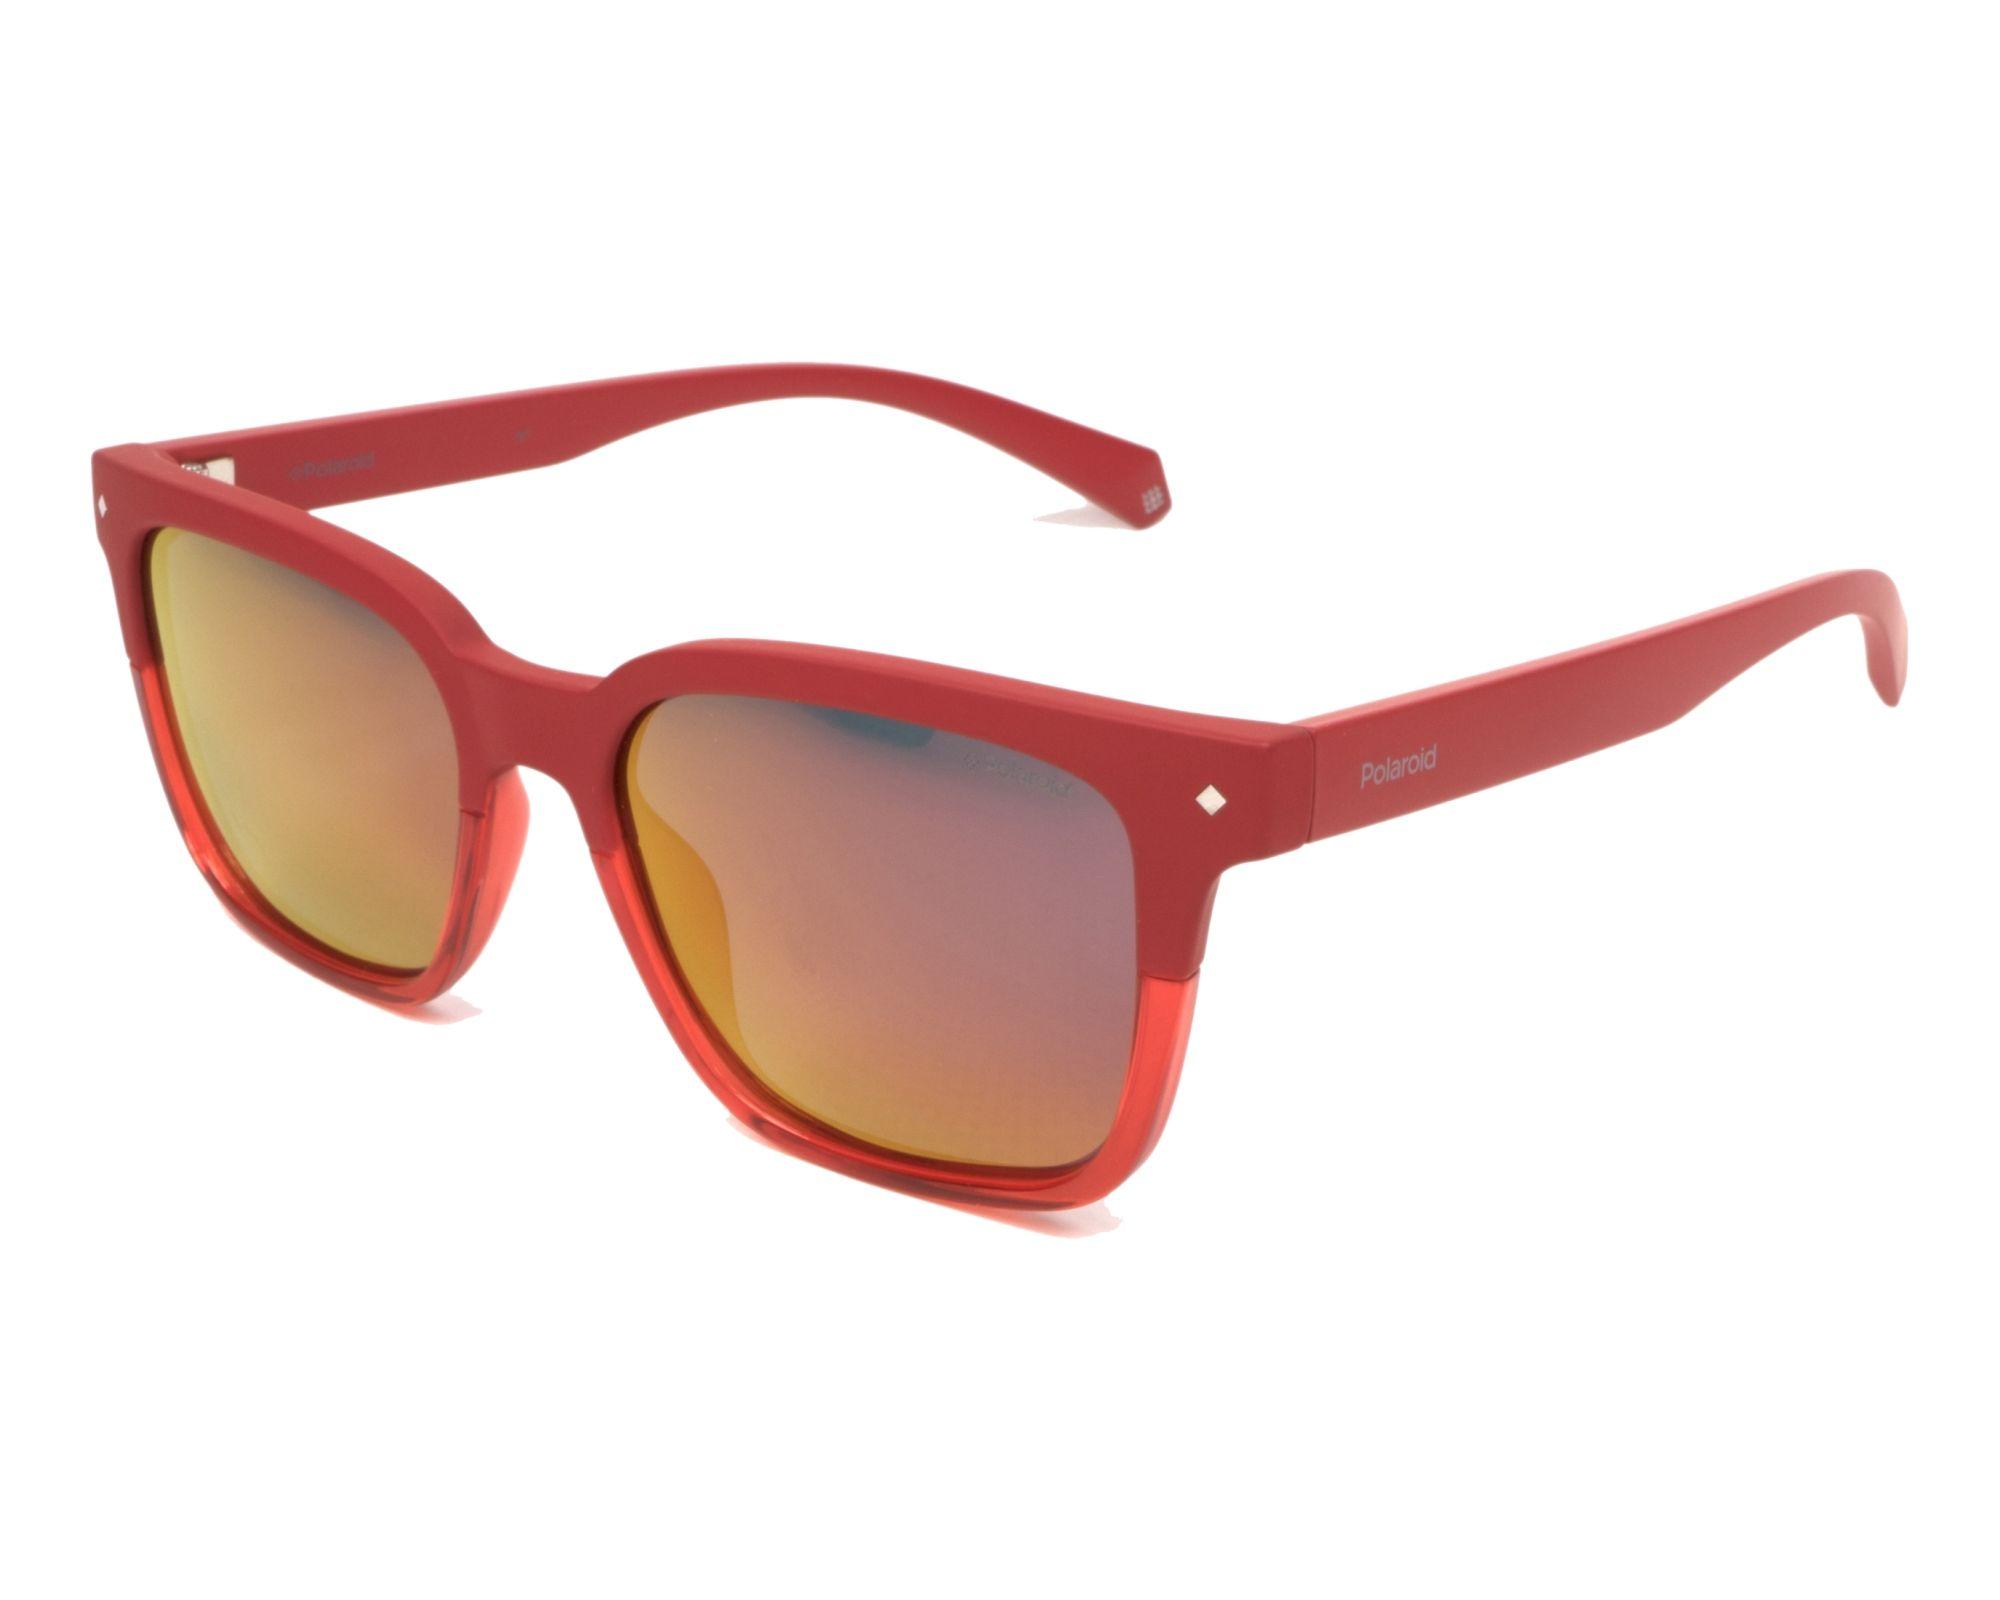 Polaroid Sonnenbrille » PLD 6044/S«, rot, C9A/OZ - rot/rot